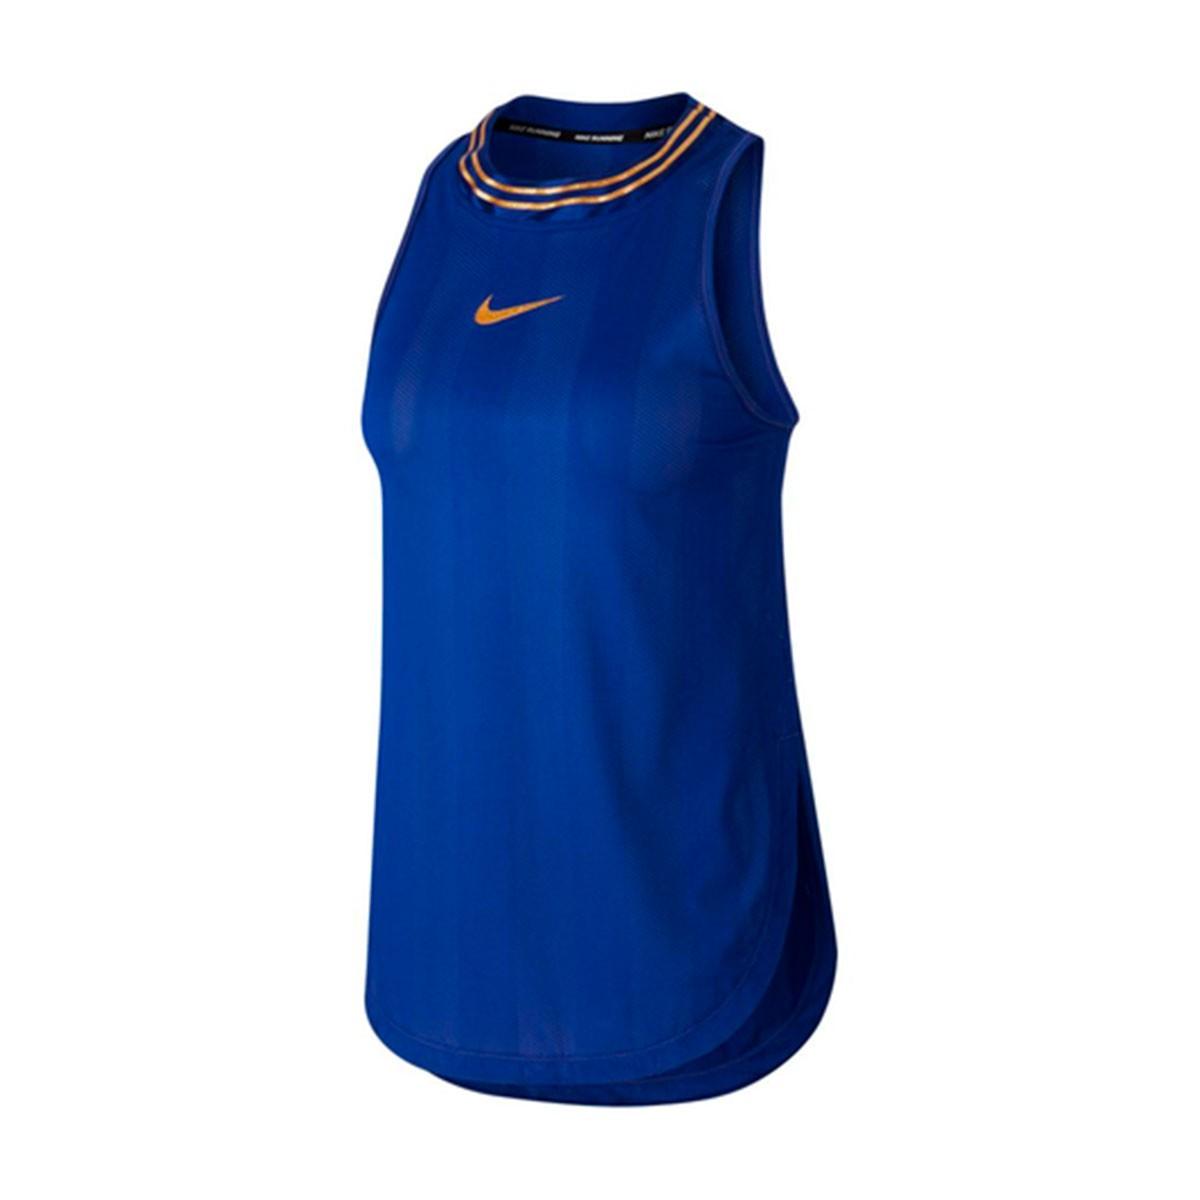 Regata Nike Tank Glam Feminino Azul